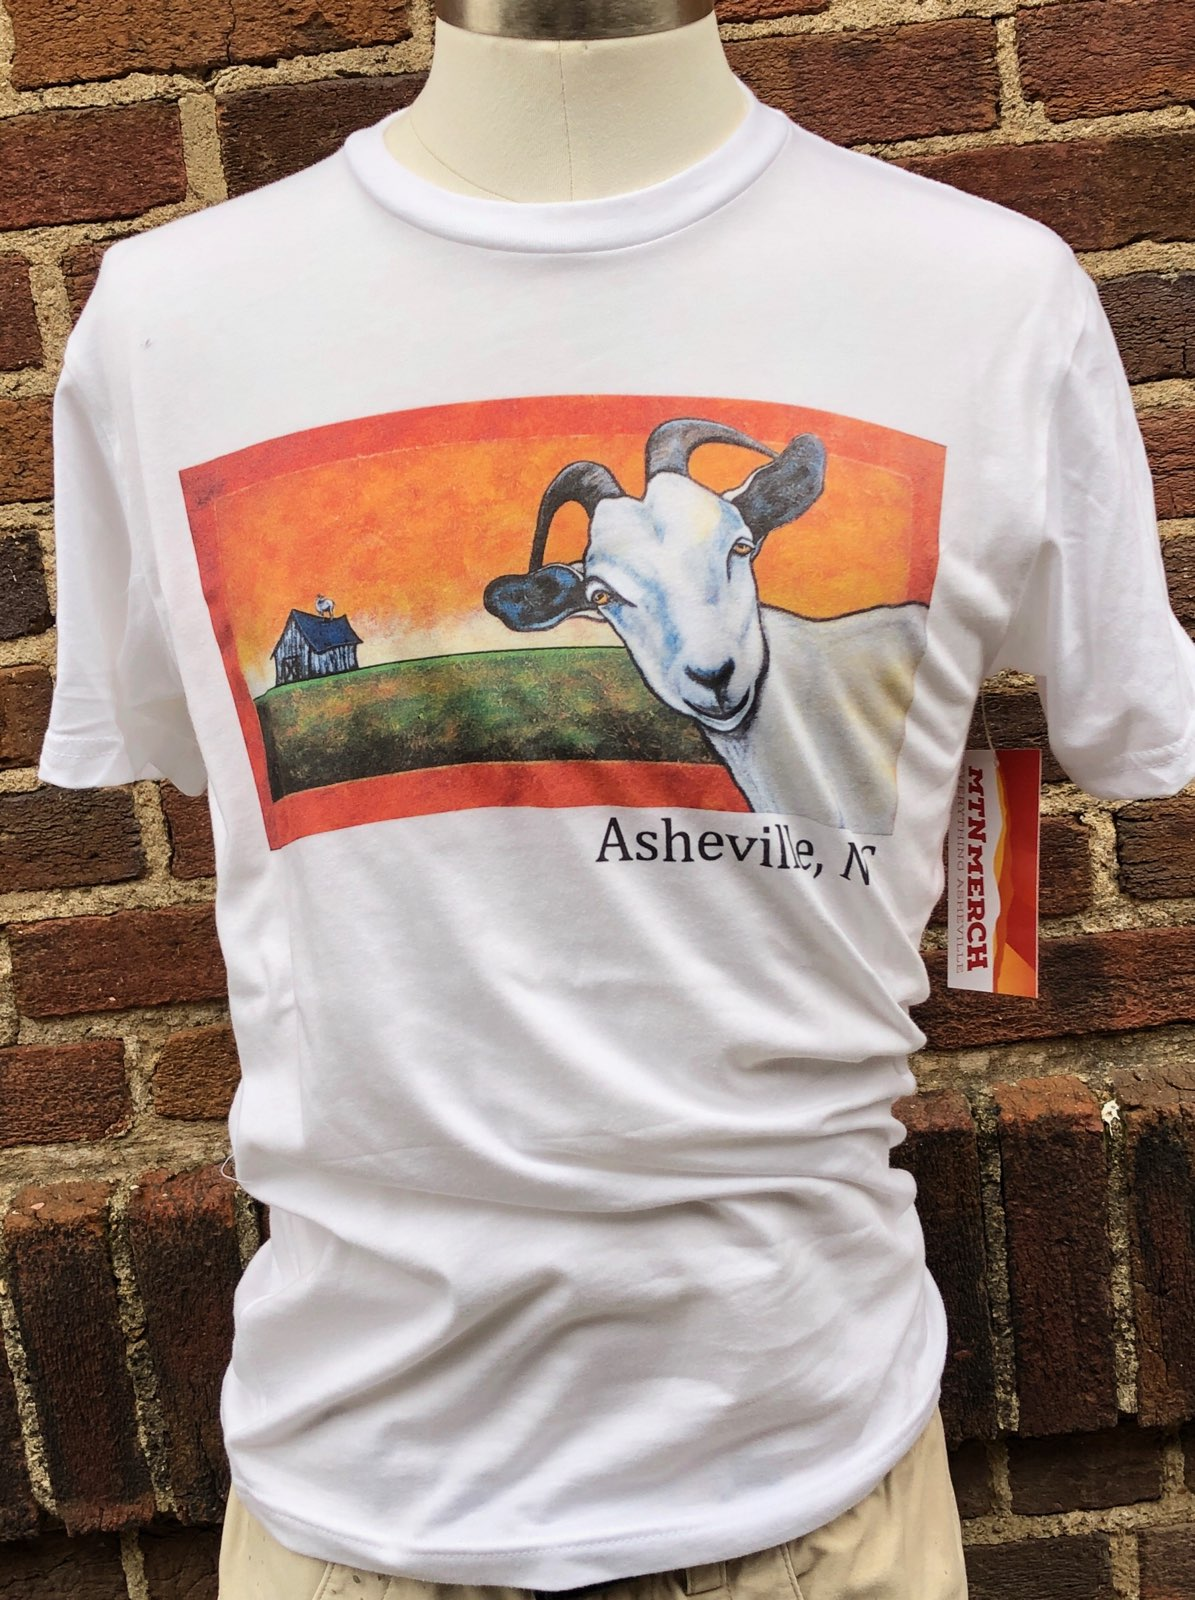 9f251937 Asheville Local Artist T-Shirts - Mountain Merch